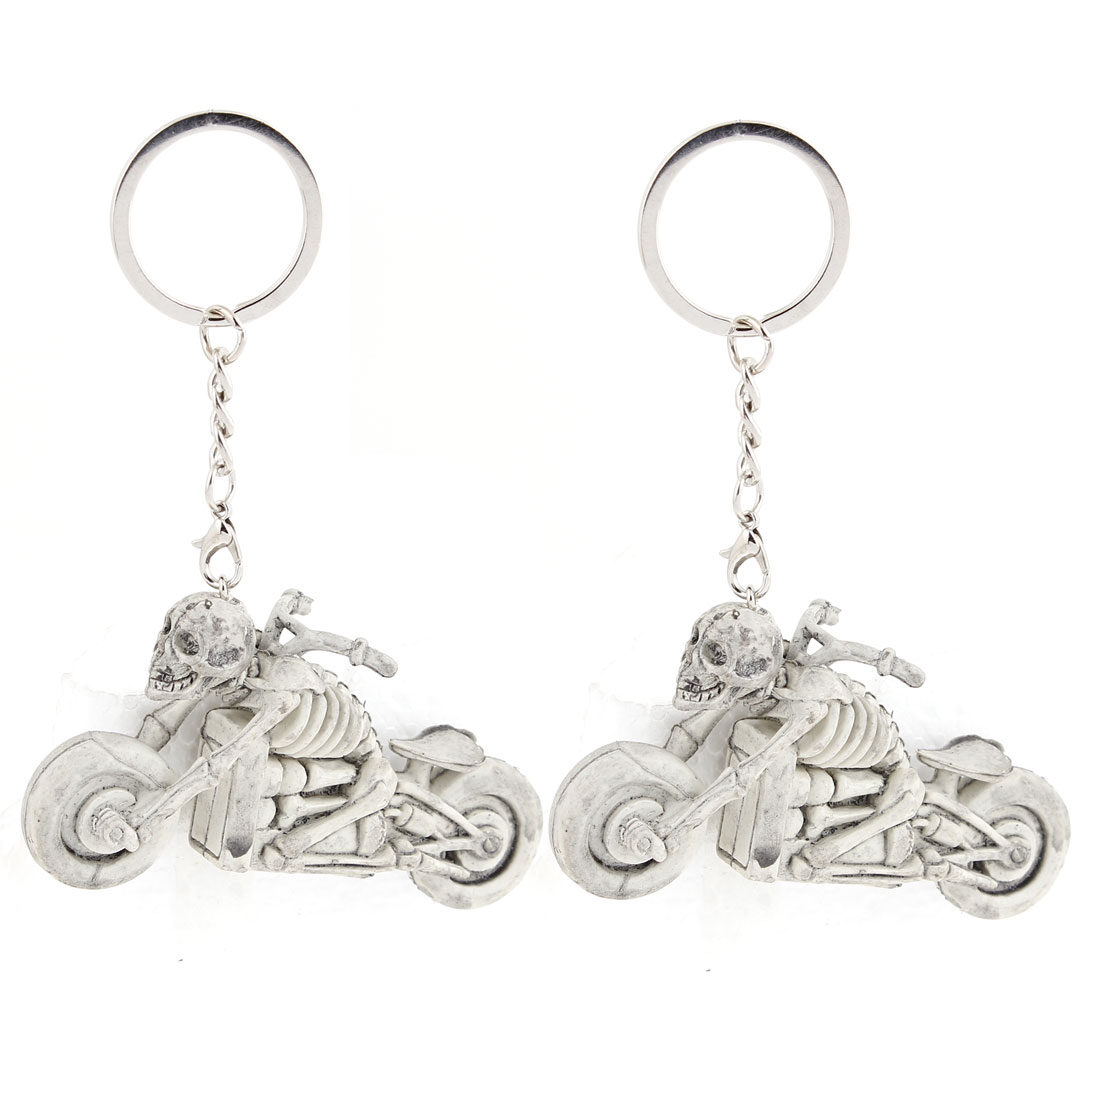 Pair Decorative Gray Plastic Skull Riding Motorcycle Dangling Pendant Key Ring